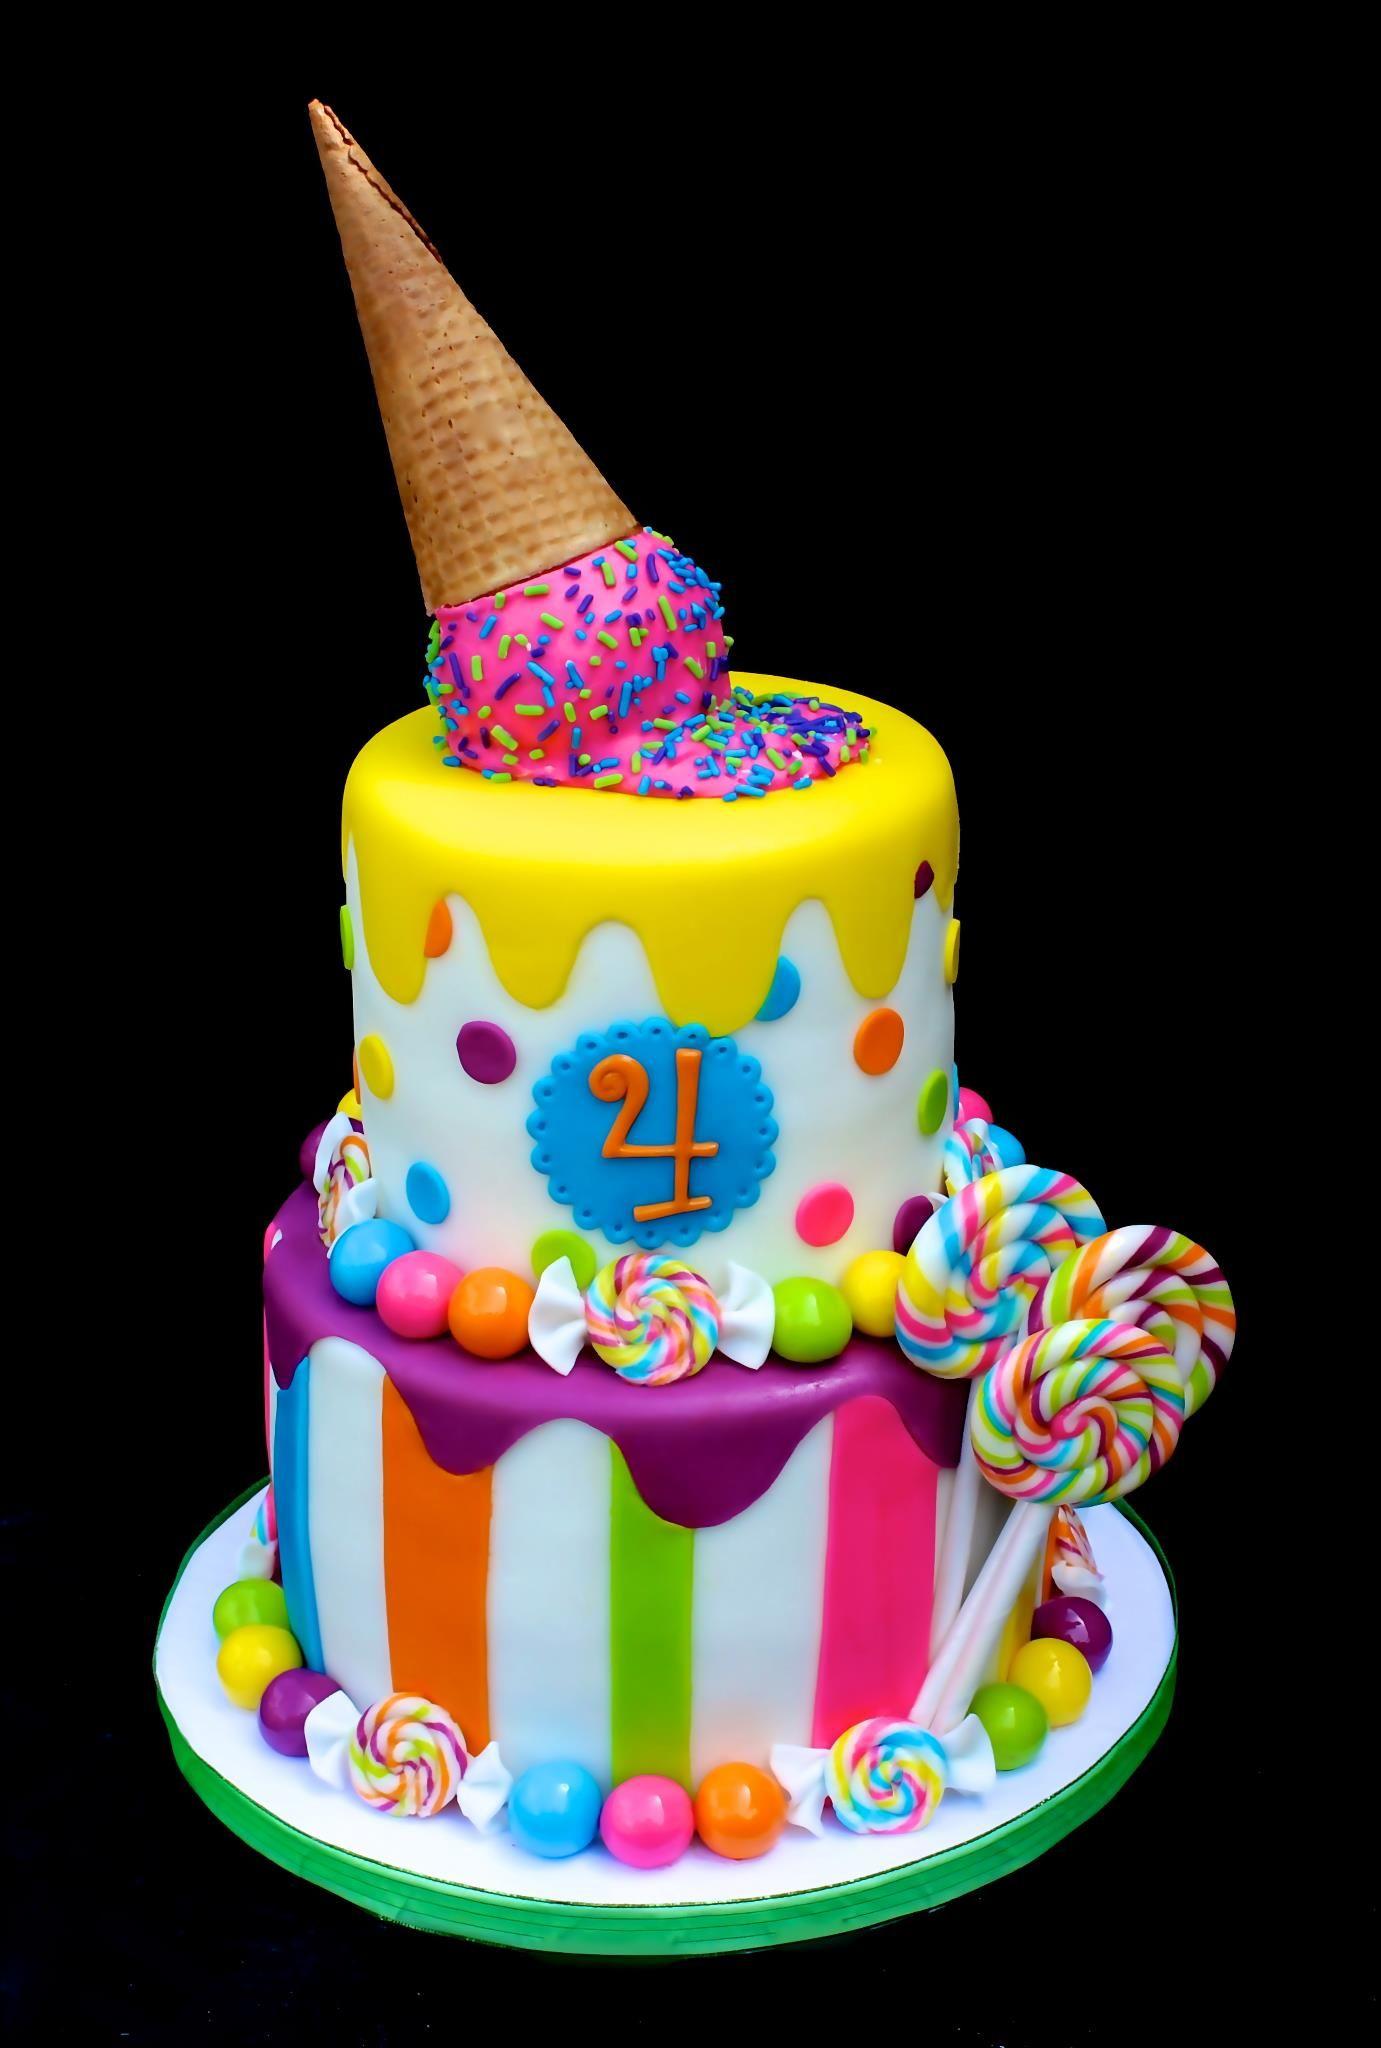 Ice cream cone pretty and bright Kid birthday cakes Pinterest